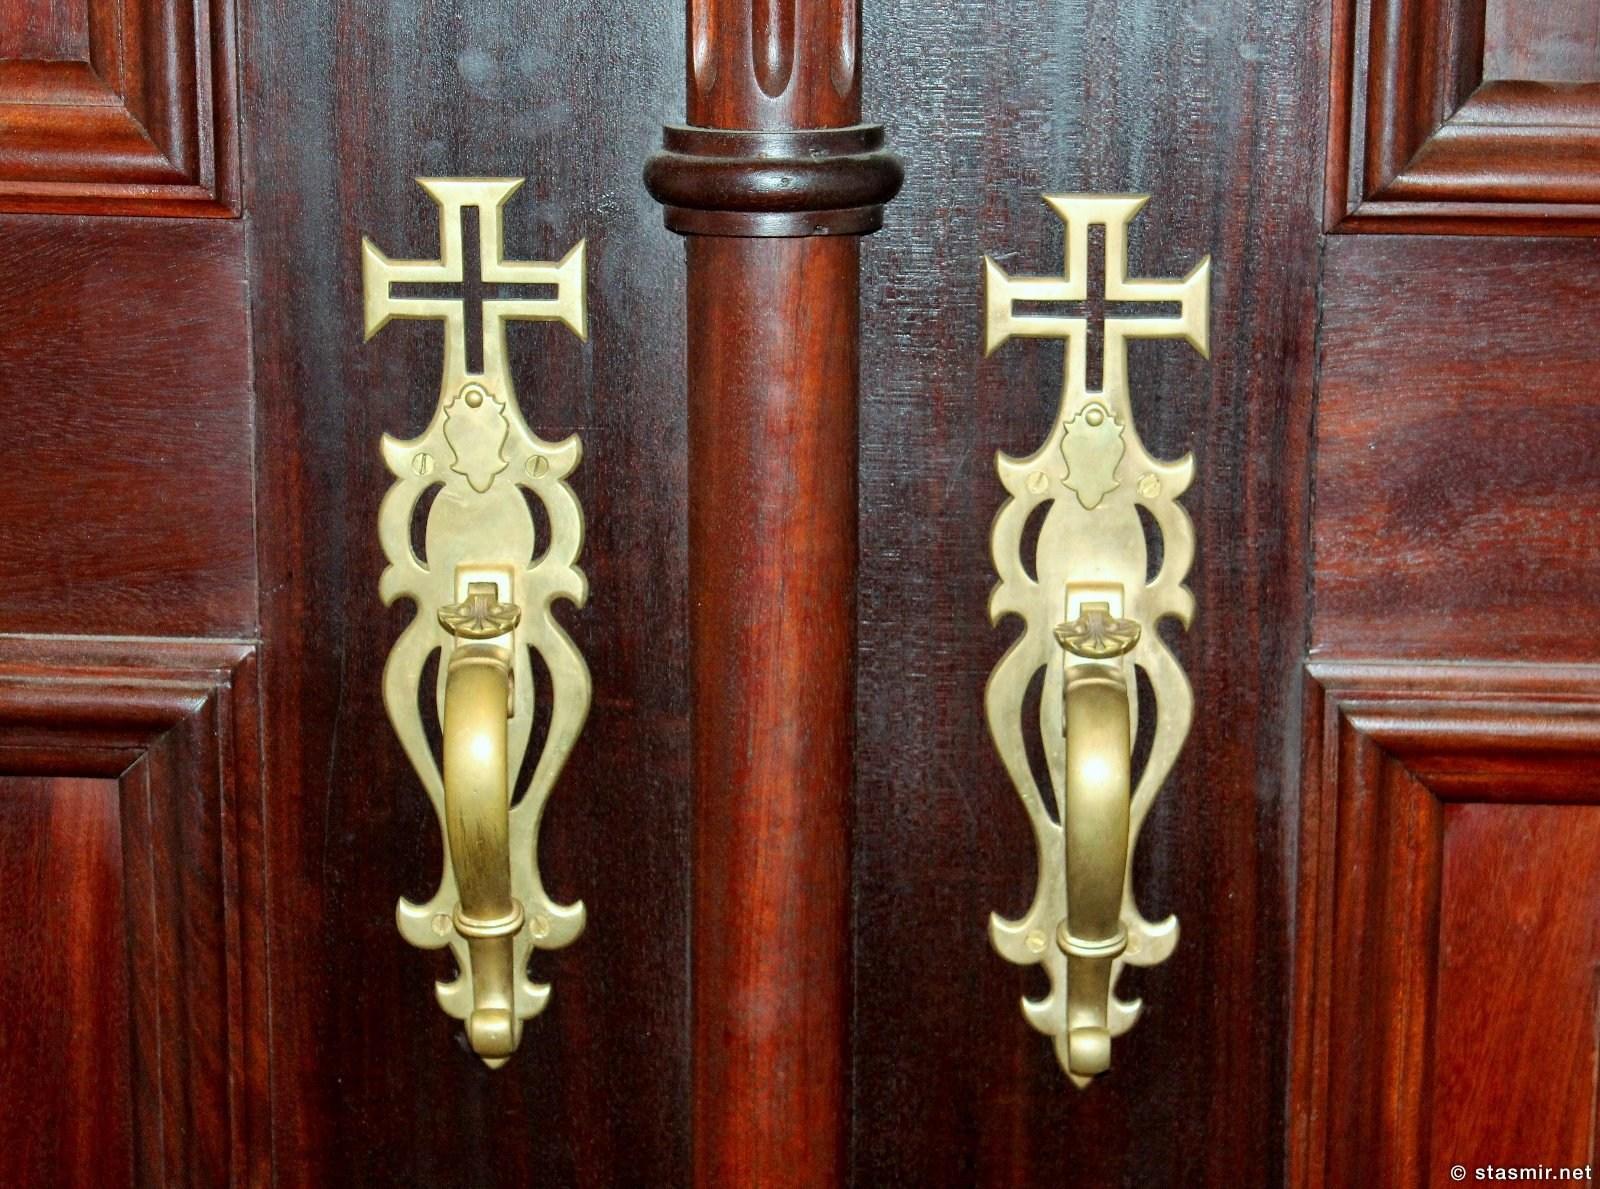 красивые двери в Basílica de Nossa Senhora do Rosário de Fátima, Monumento ao Sagrado Coração de Jesus , Фатима, Португалия, фото Стасмир, Photo Stasmir